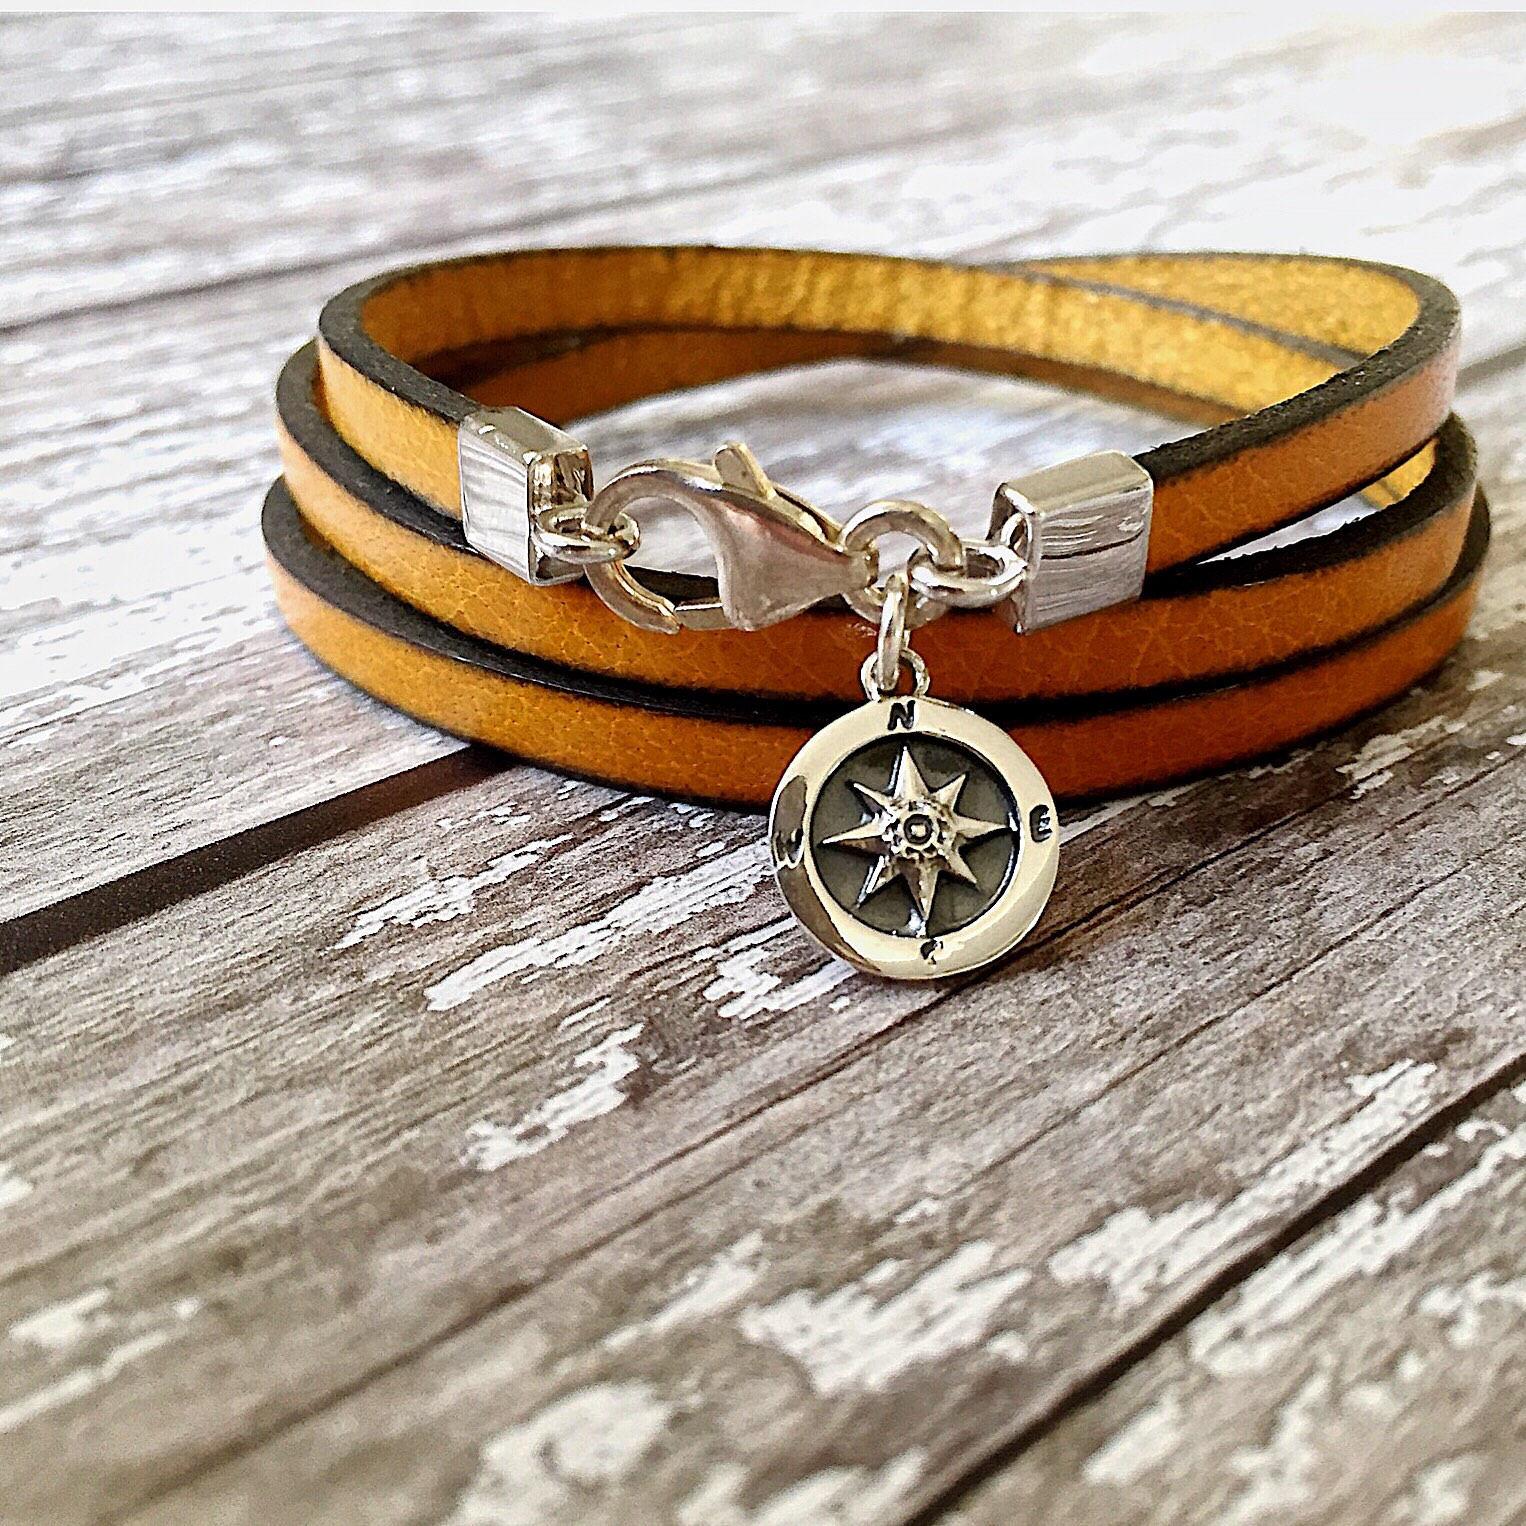 Compass Leather Bracelet